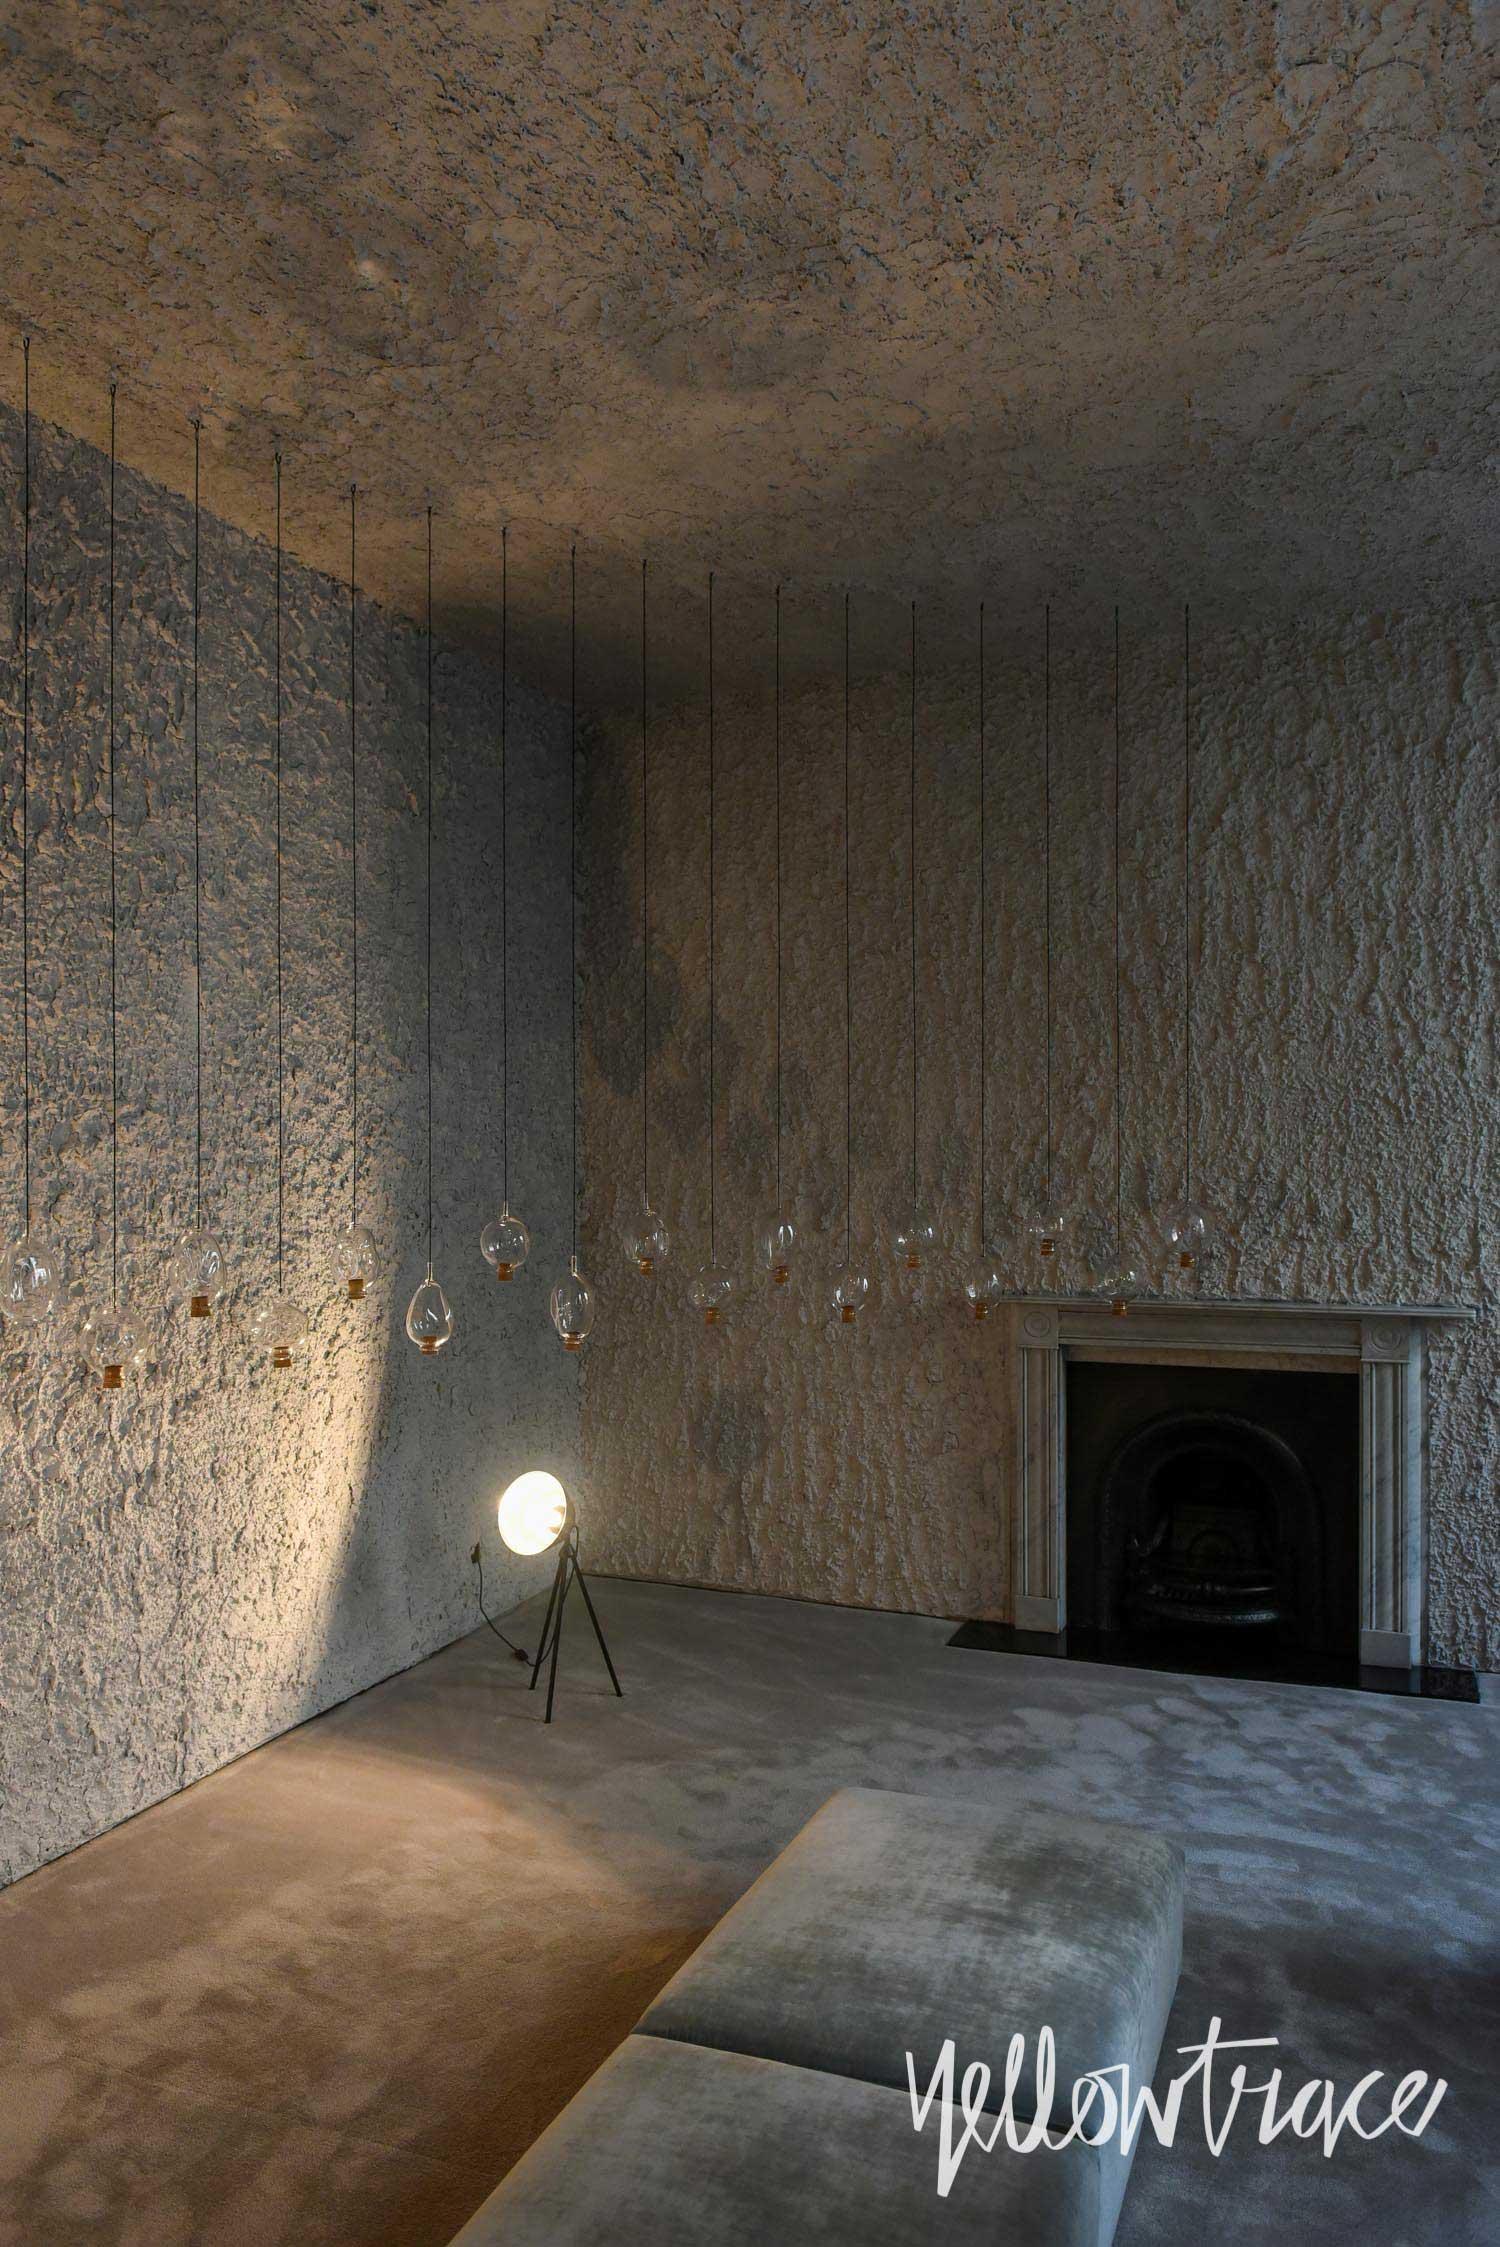 Illuminium Dover St London, Photo ©Nick Hughes | Yellowtrace